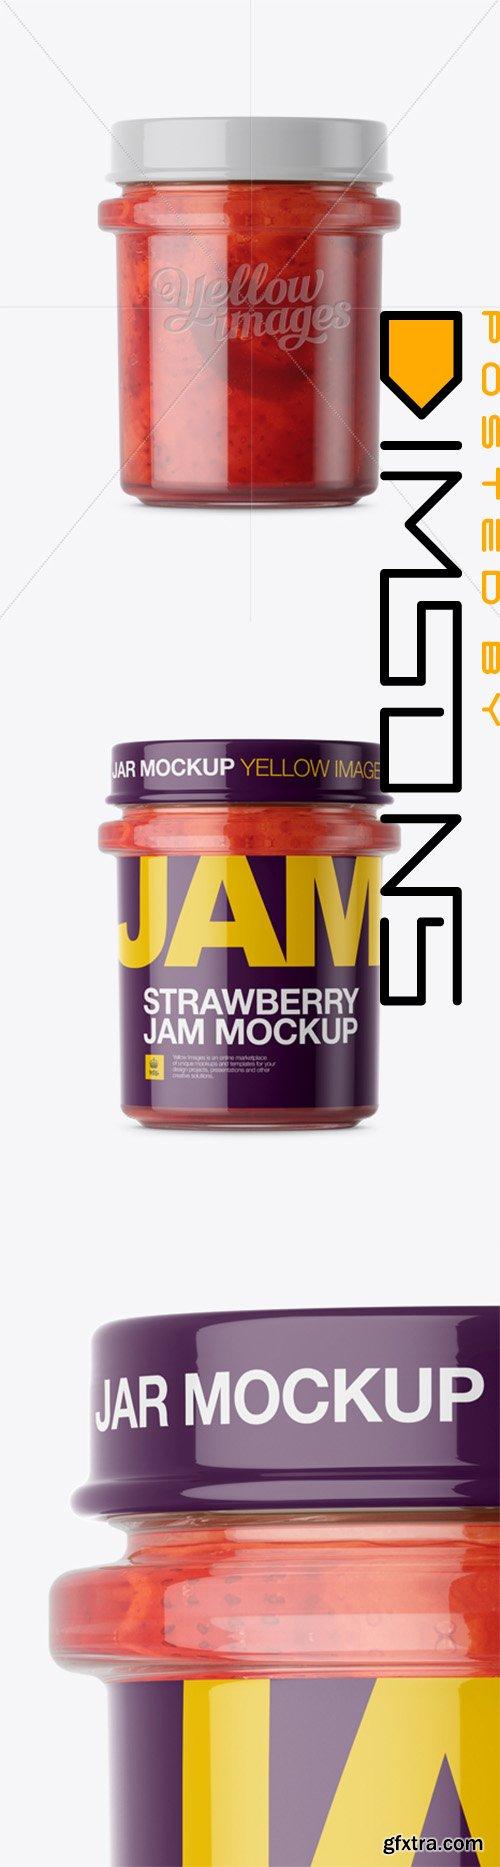 Glass Strawberry Jam Jar Mockup - Front View 13907